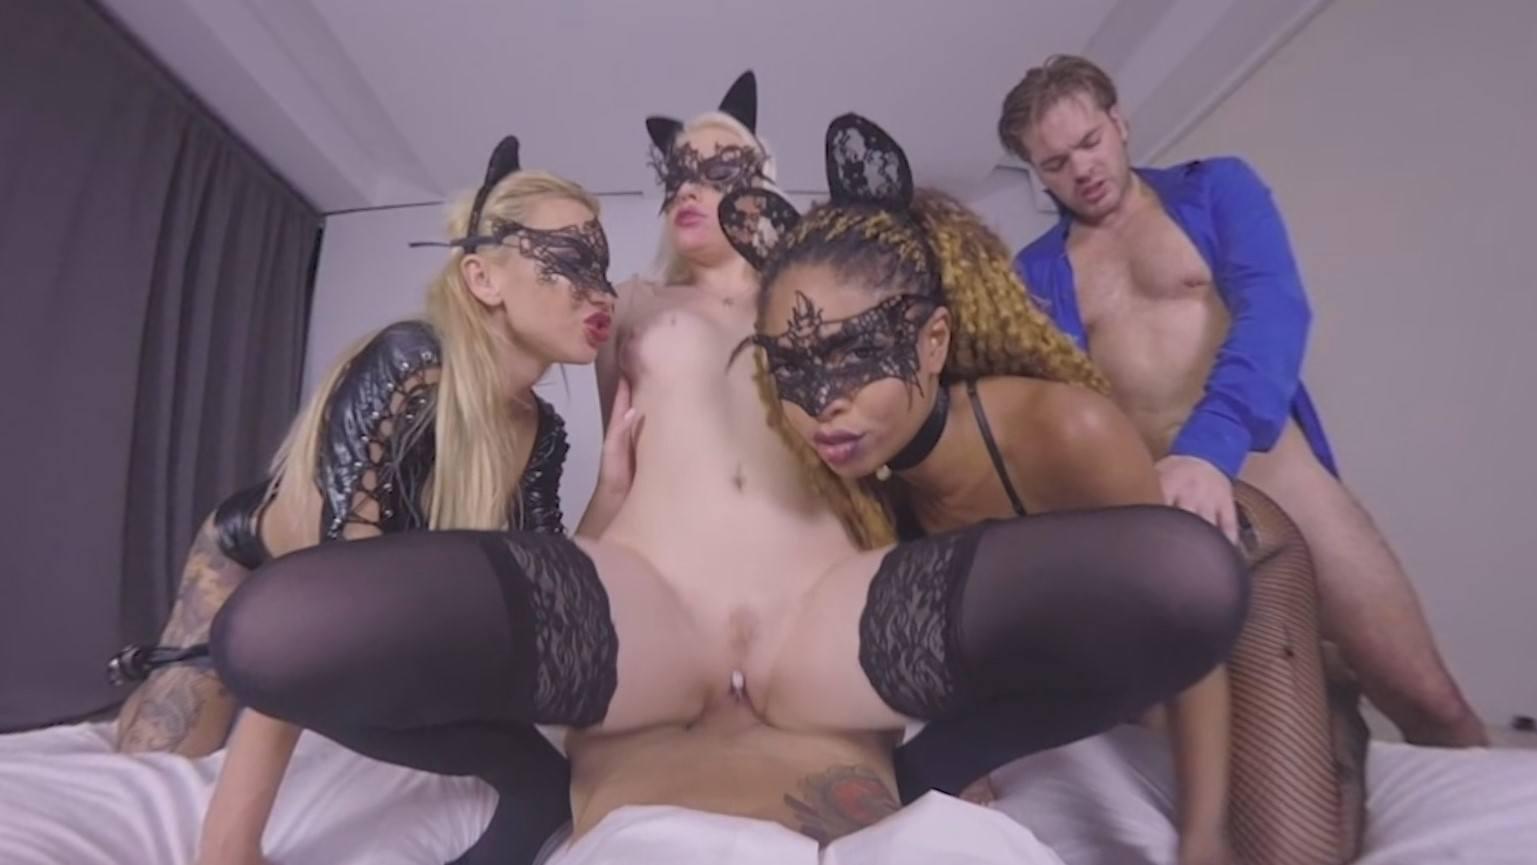 TRAILER: Special  - Hardcore Virtual Reality Porn Orgy